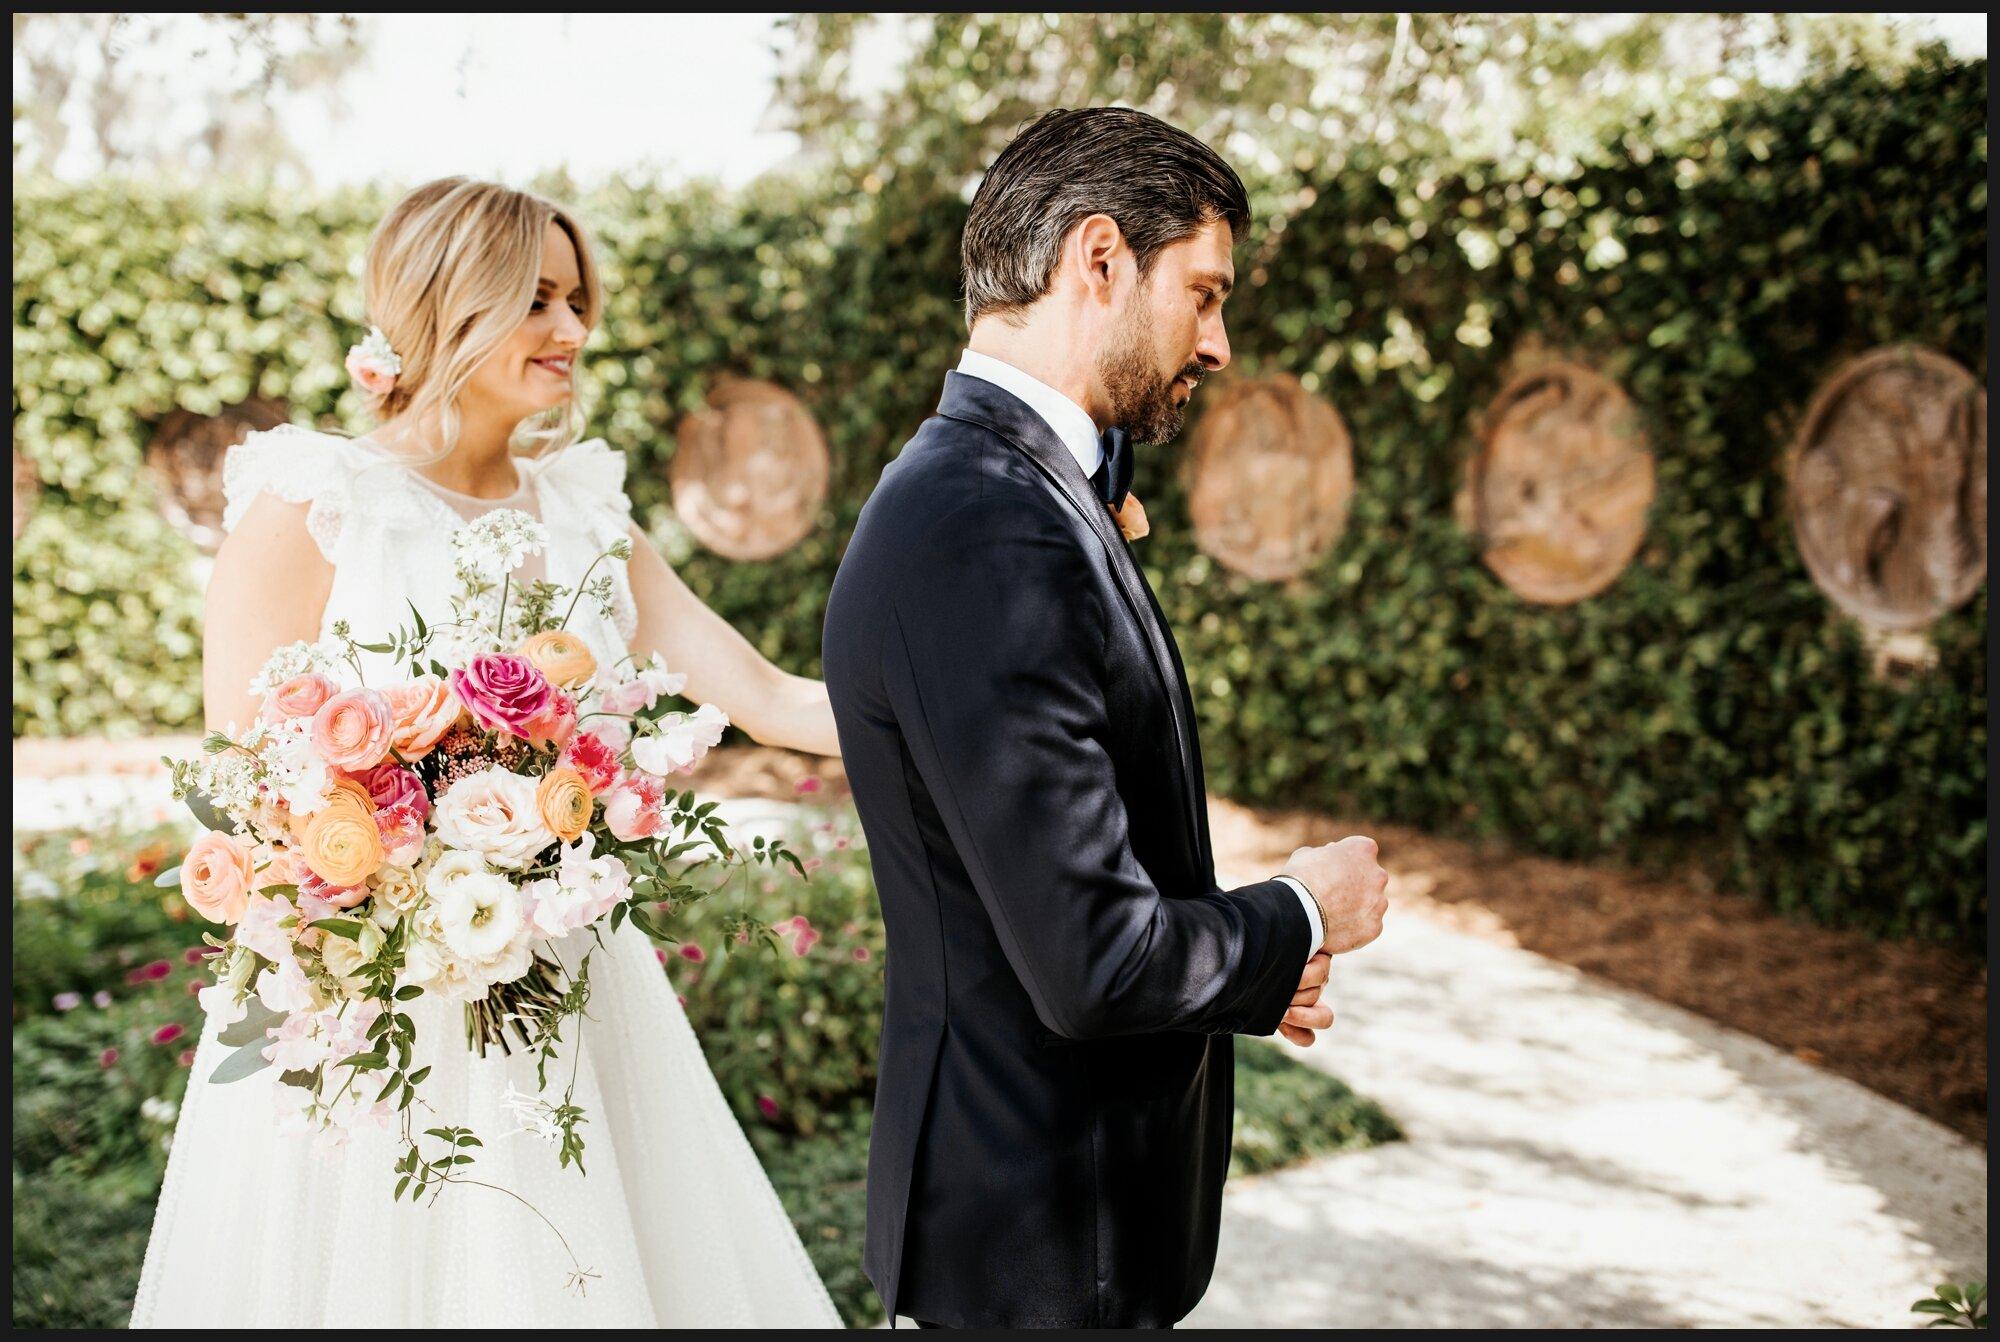 Orlando-Wedding-Photographer-destination-wedding-photographer-florida-wedding-photographer-hawaii-wedding-photographer_0738.jpg